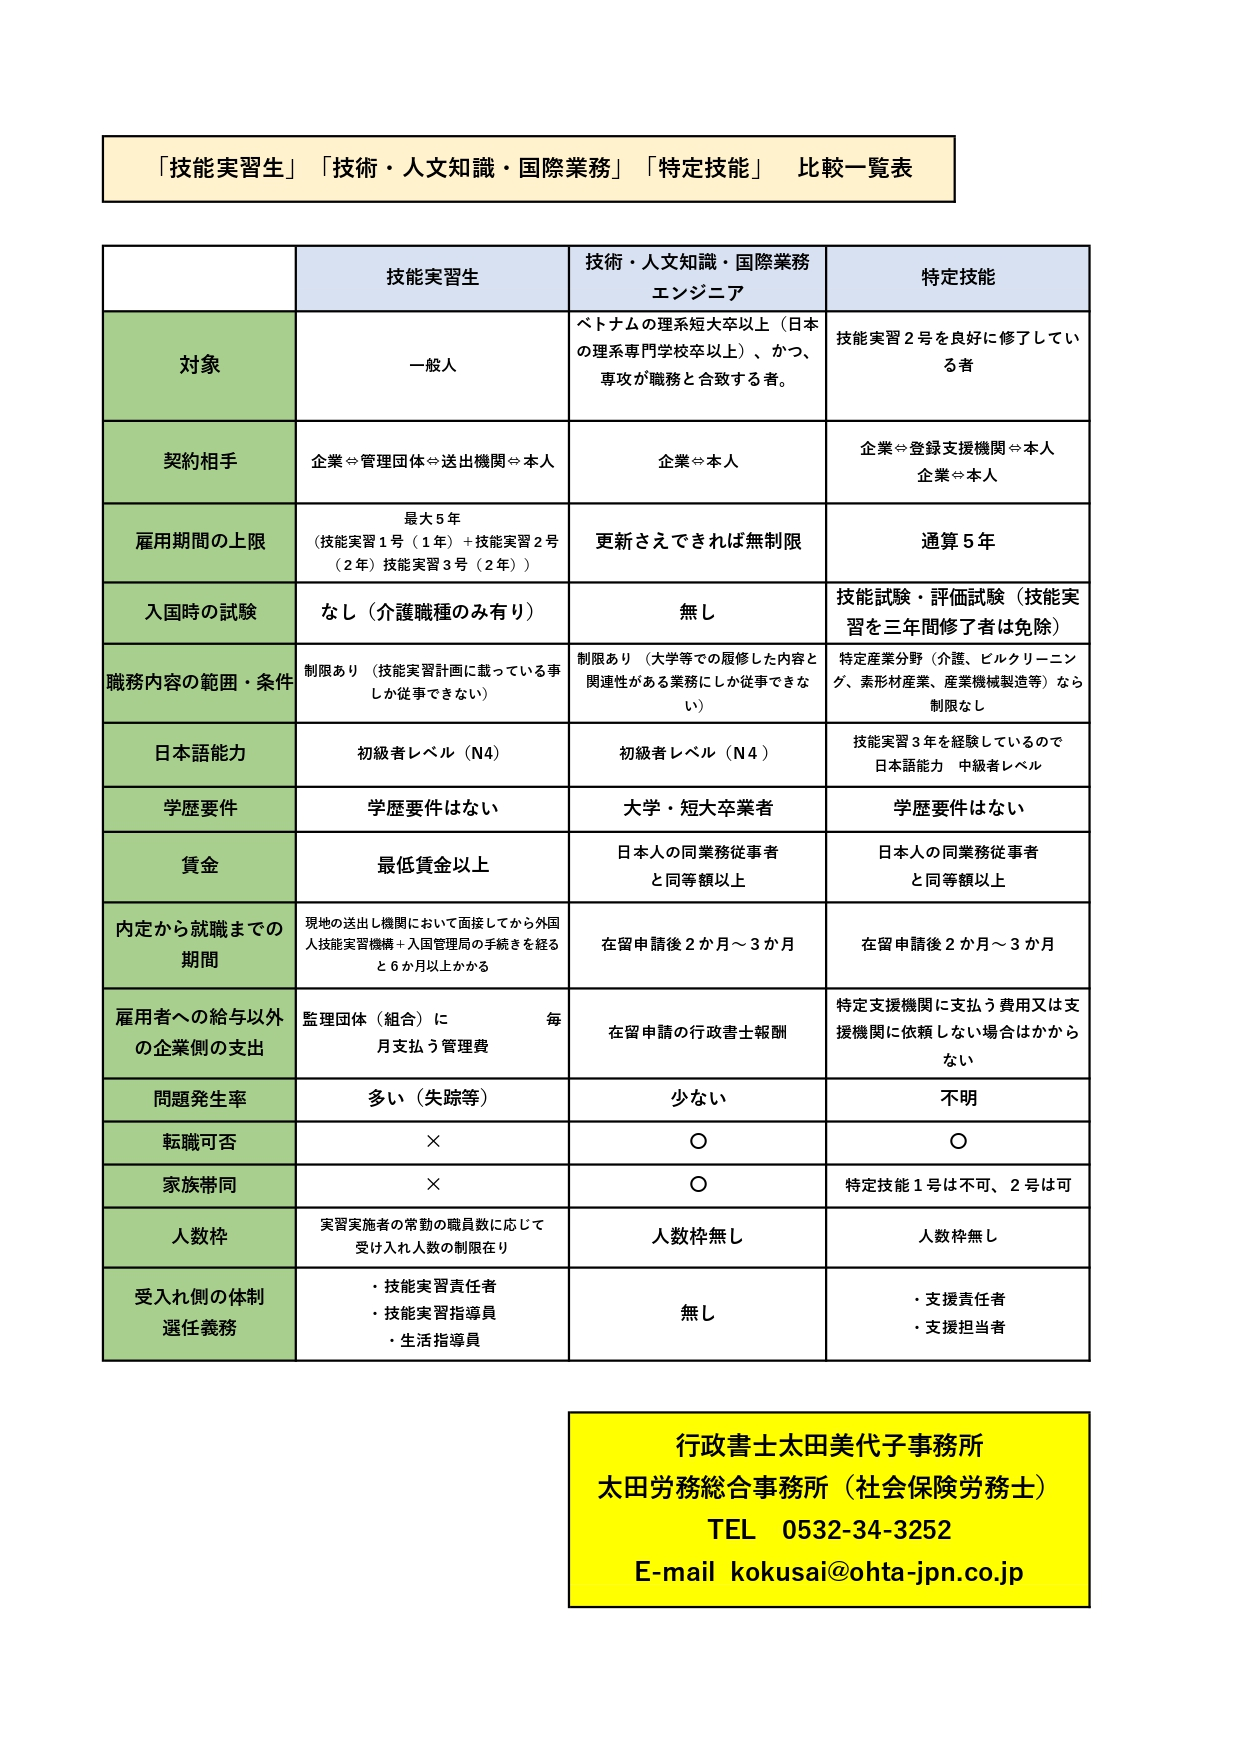 比較一覧表_page-0001 (1)